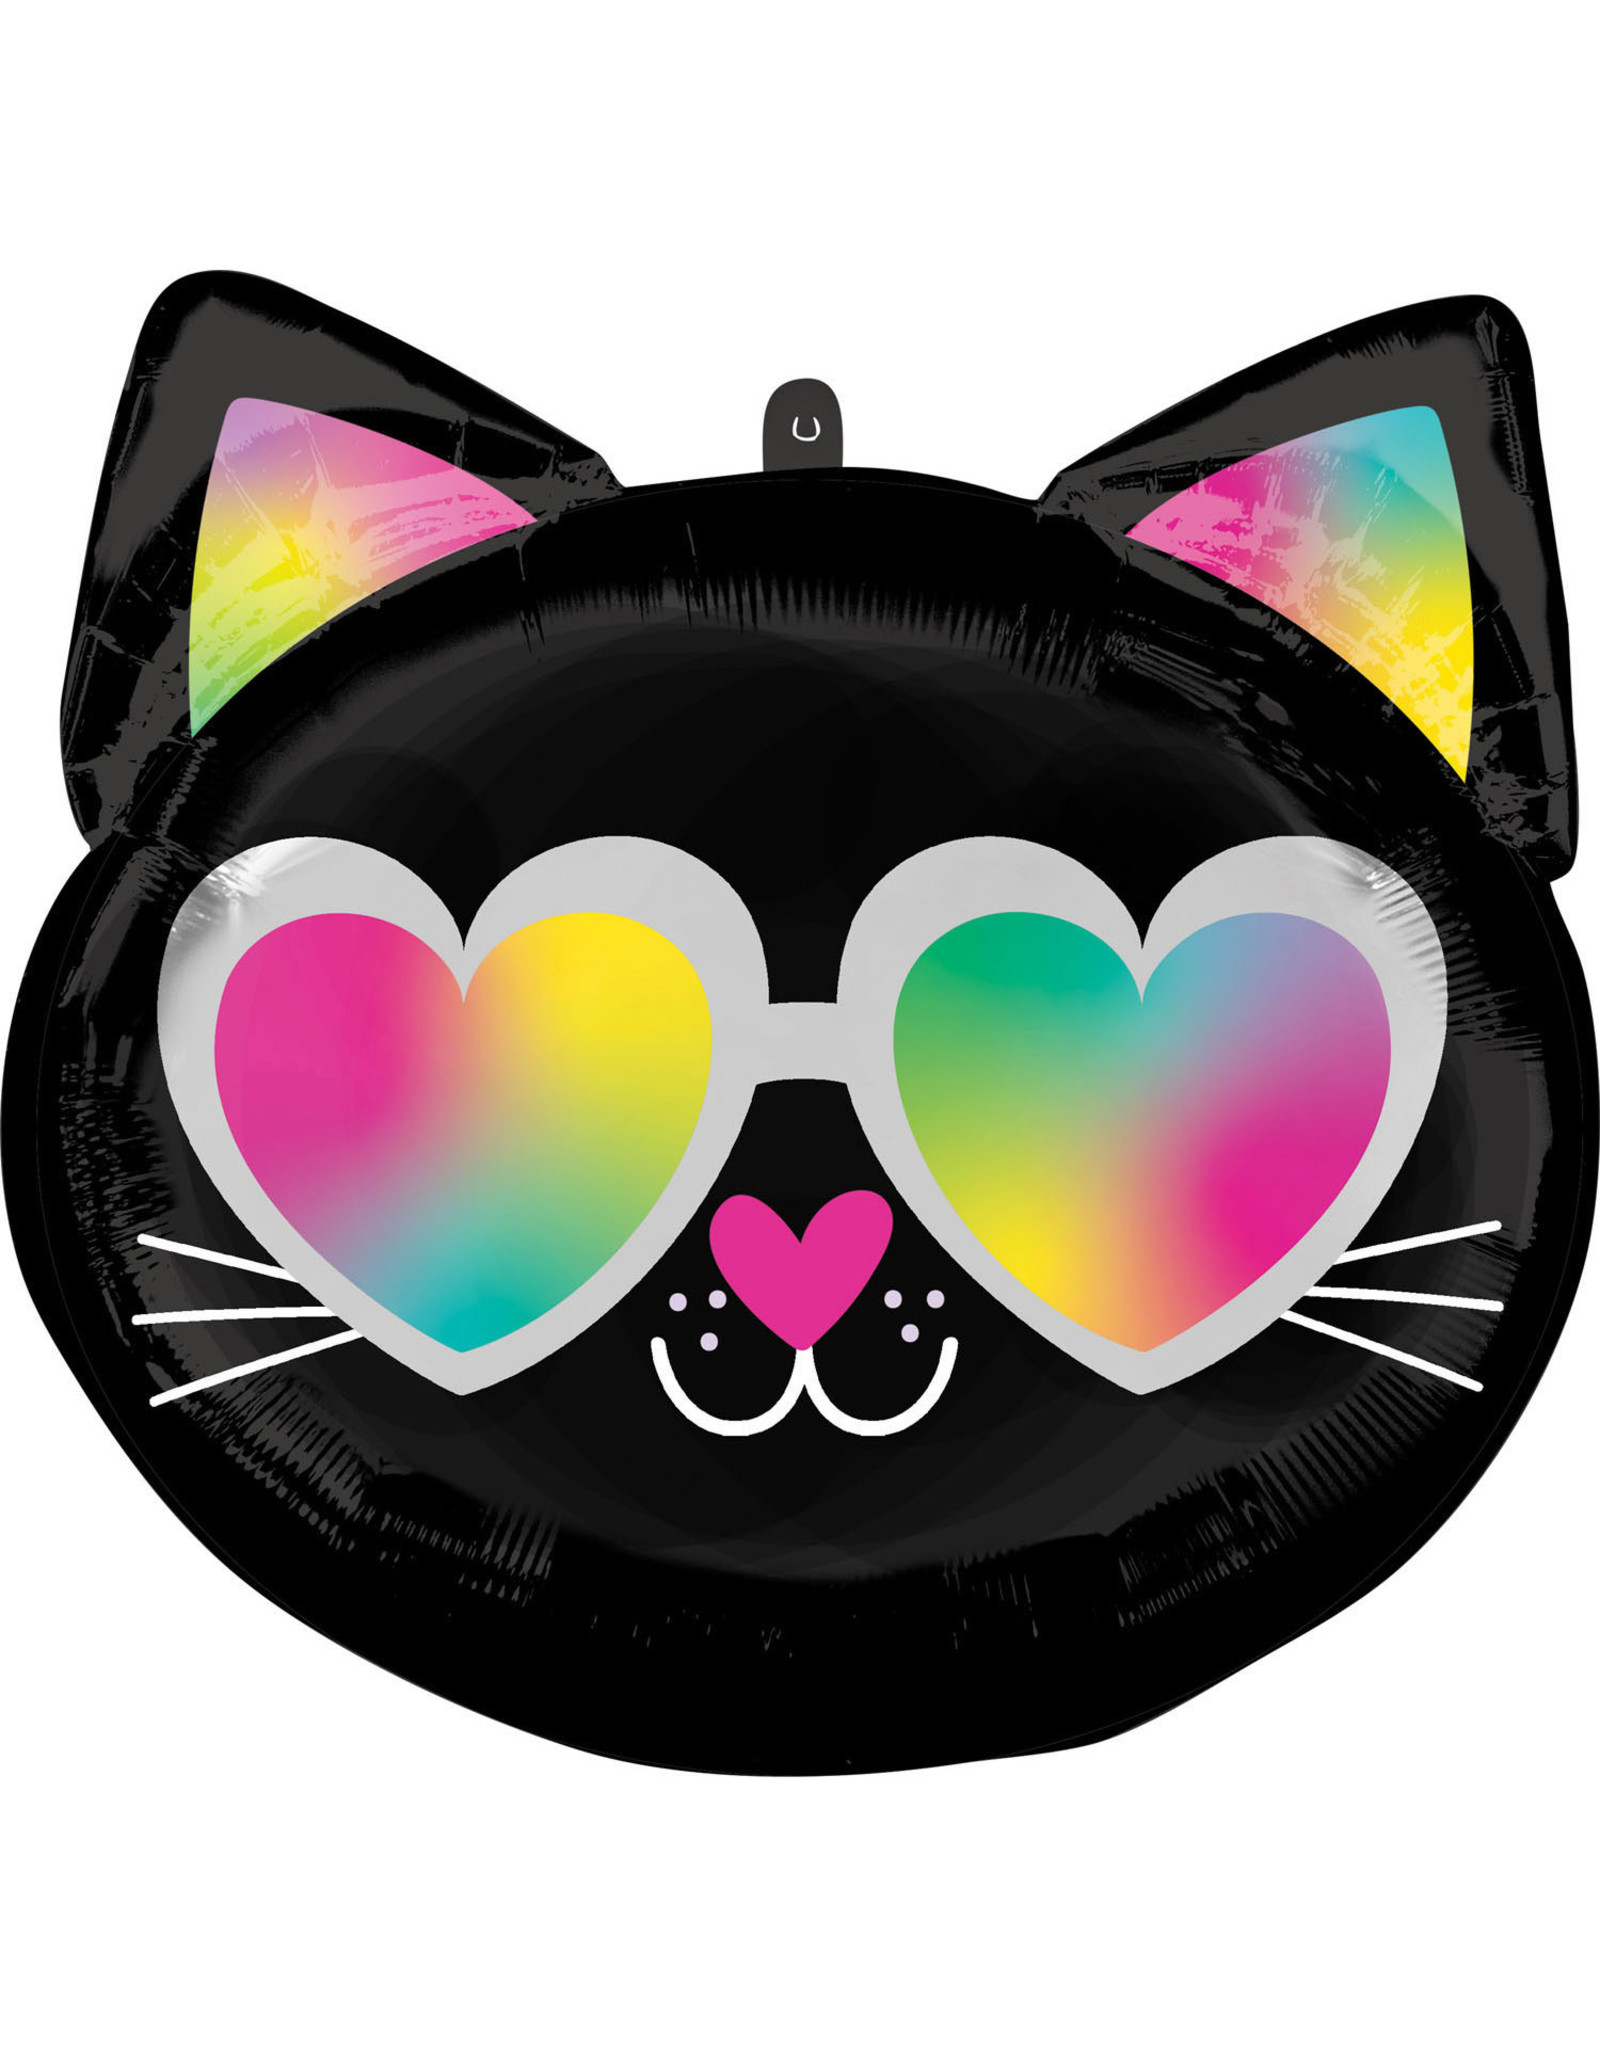 Amscan folieballon standard shape cool kitty 2-zijdig 43 cm x 43 cm